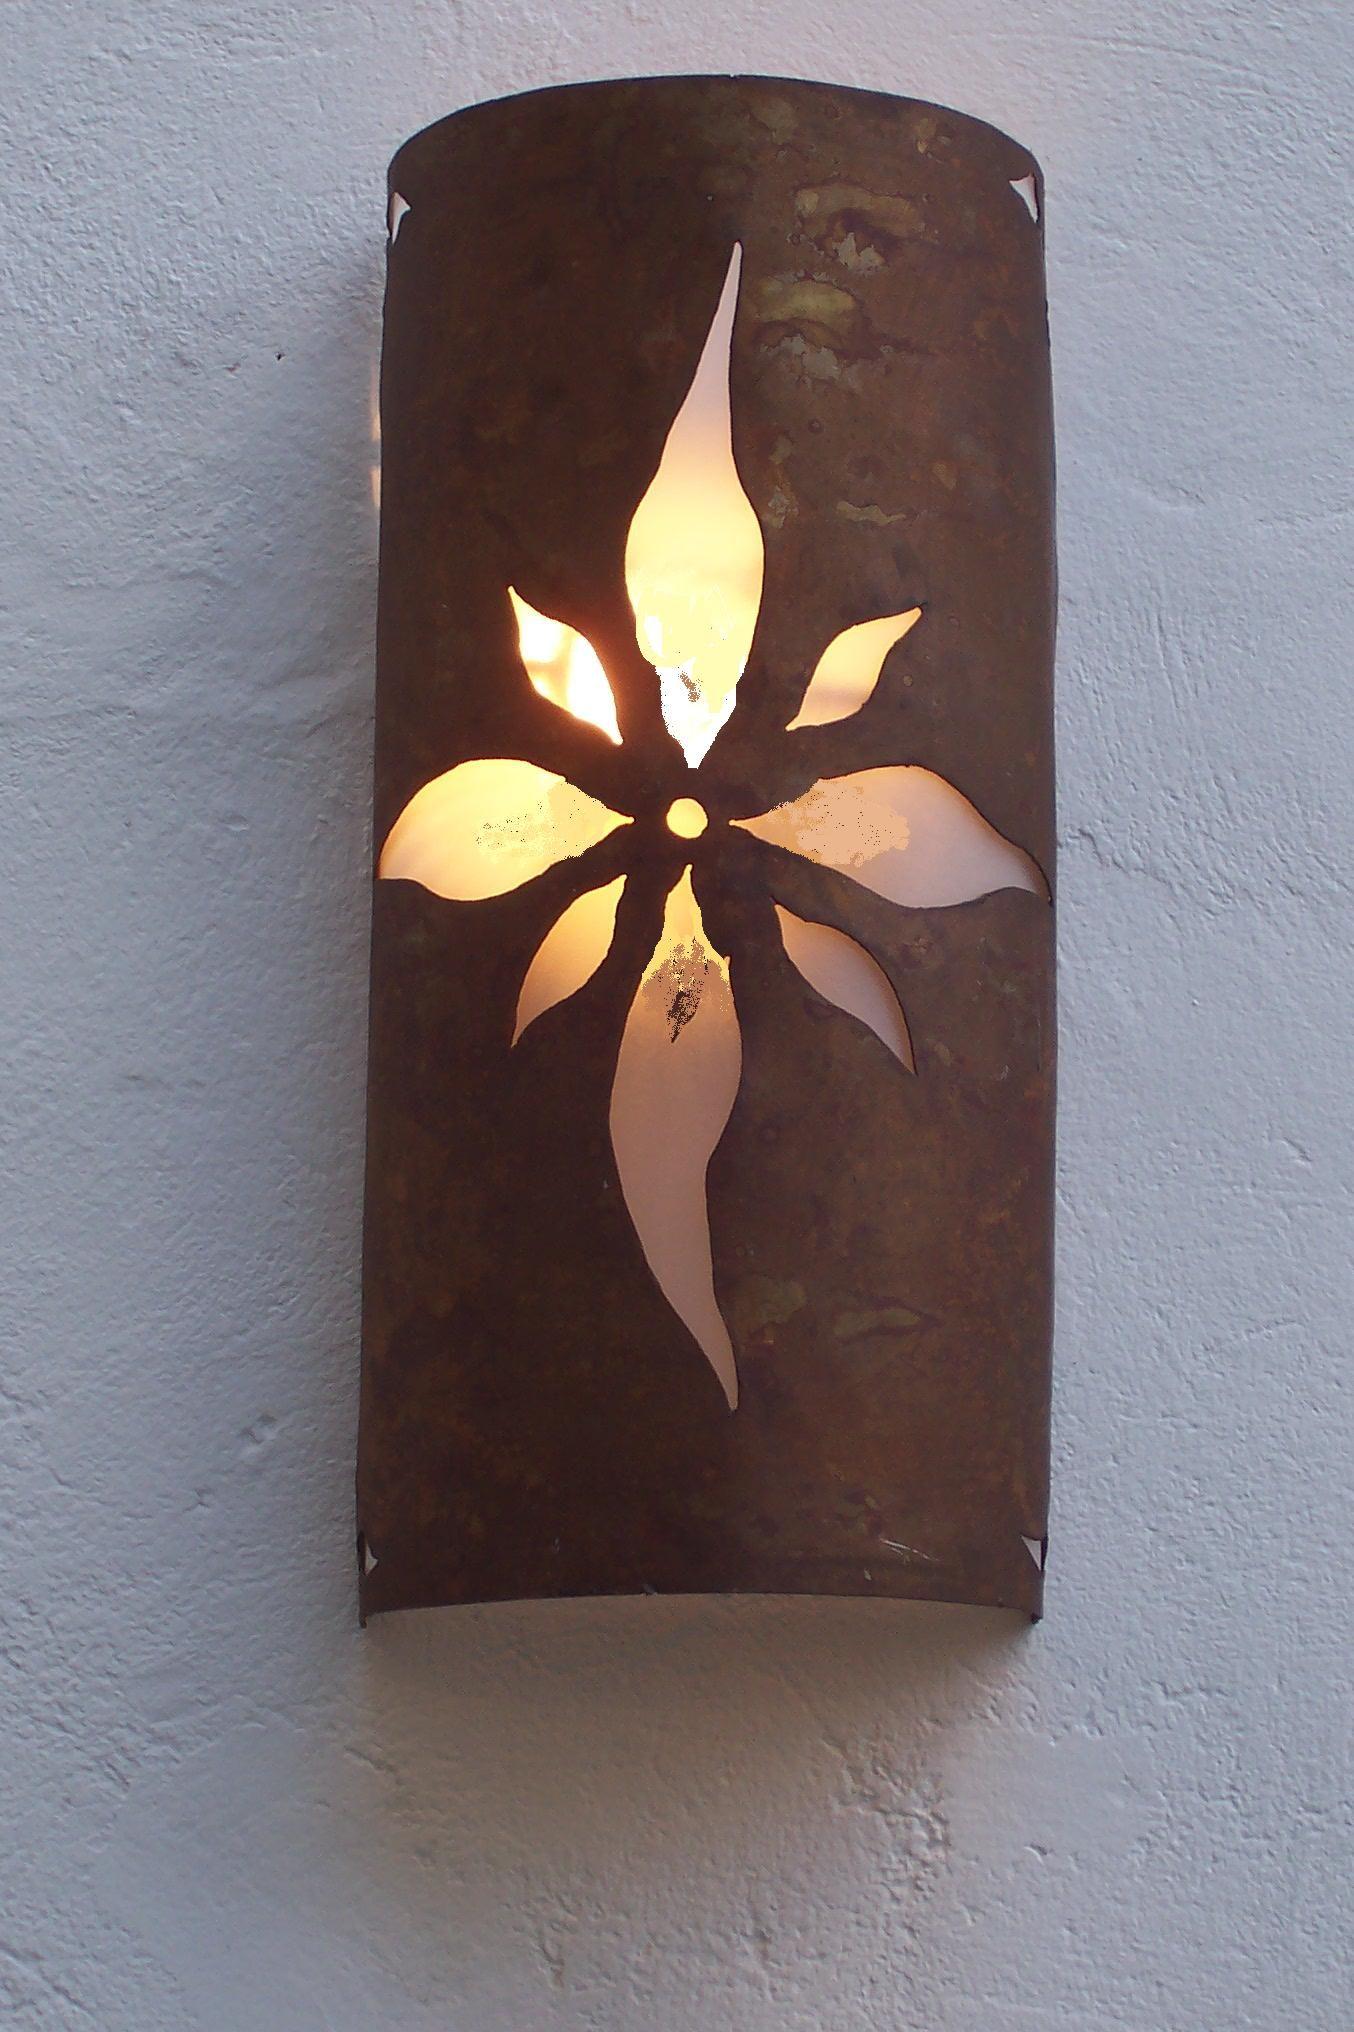 Aplique Media Cana Calado Flor Lampara De Bambu Lamparas De Ceramica Pantallas De Lamparas